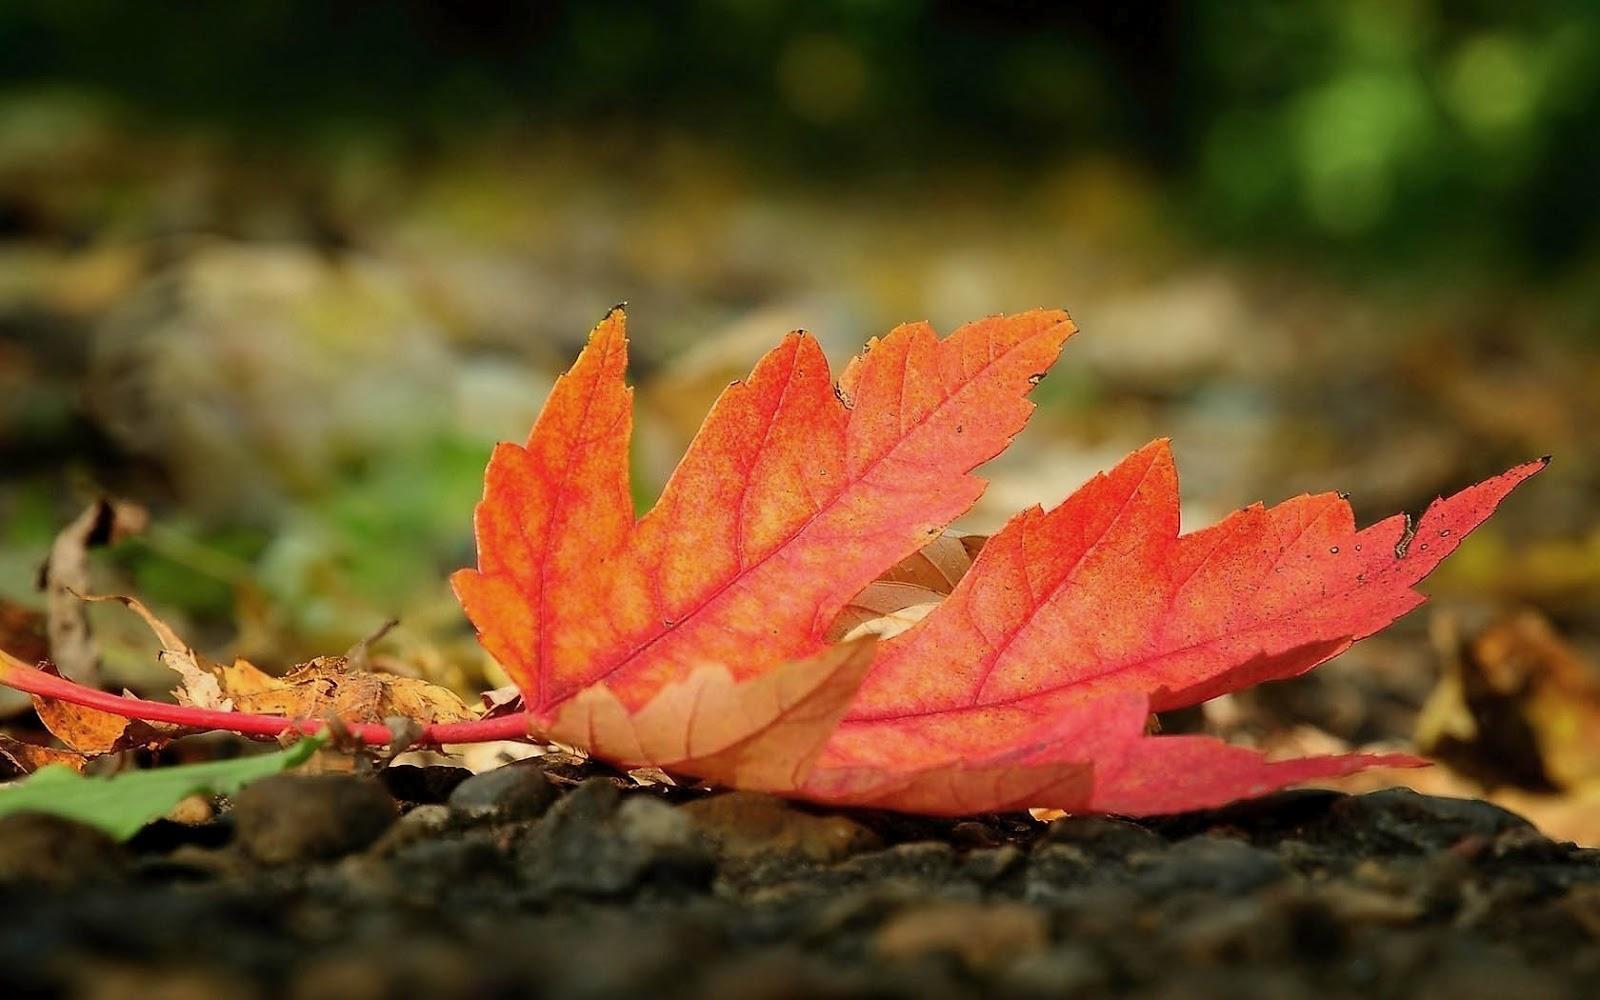 http://2.bp.blogspot.com/-TVb9raqLwJg/UE3J2d3dr_I/AAAAAAAAHM4/7cECyl8bH5g/s1600/hd-herfst-wallpaper-met-groot-rood-herfstblad-op-de-grond-herfst-achtergrond-foto.jpg